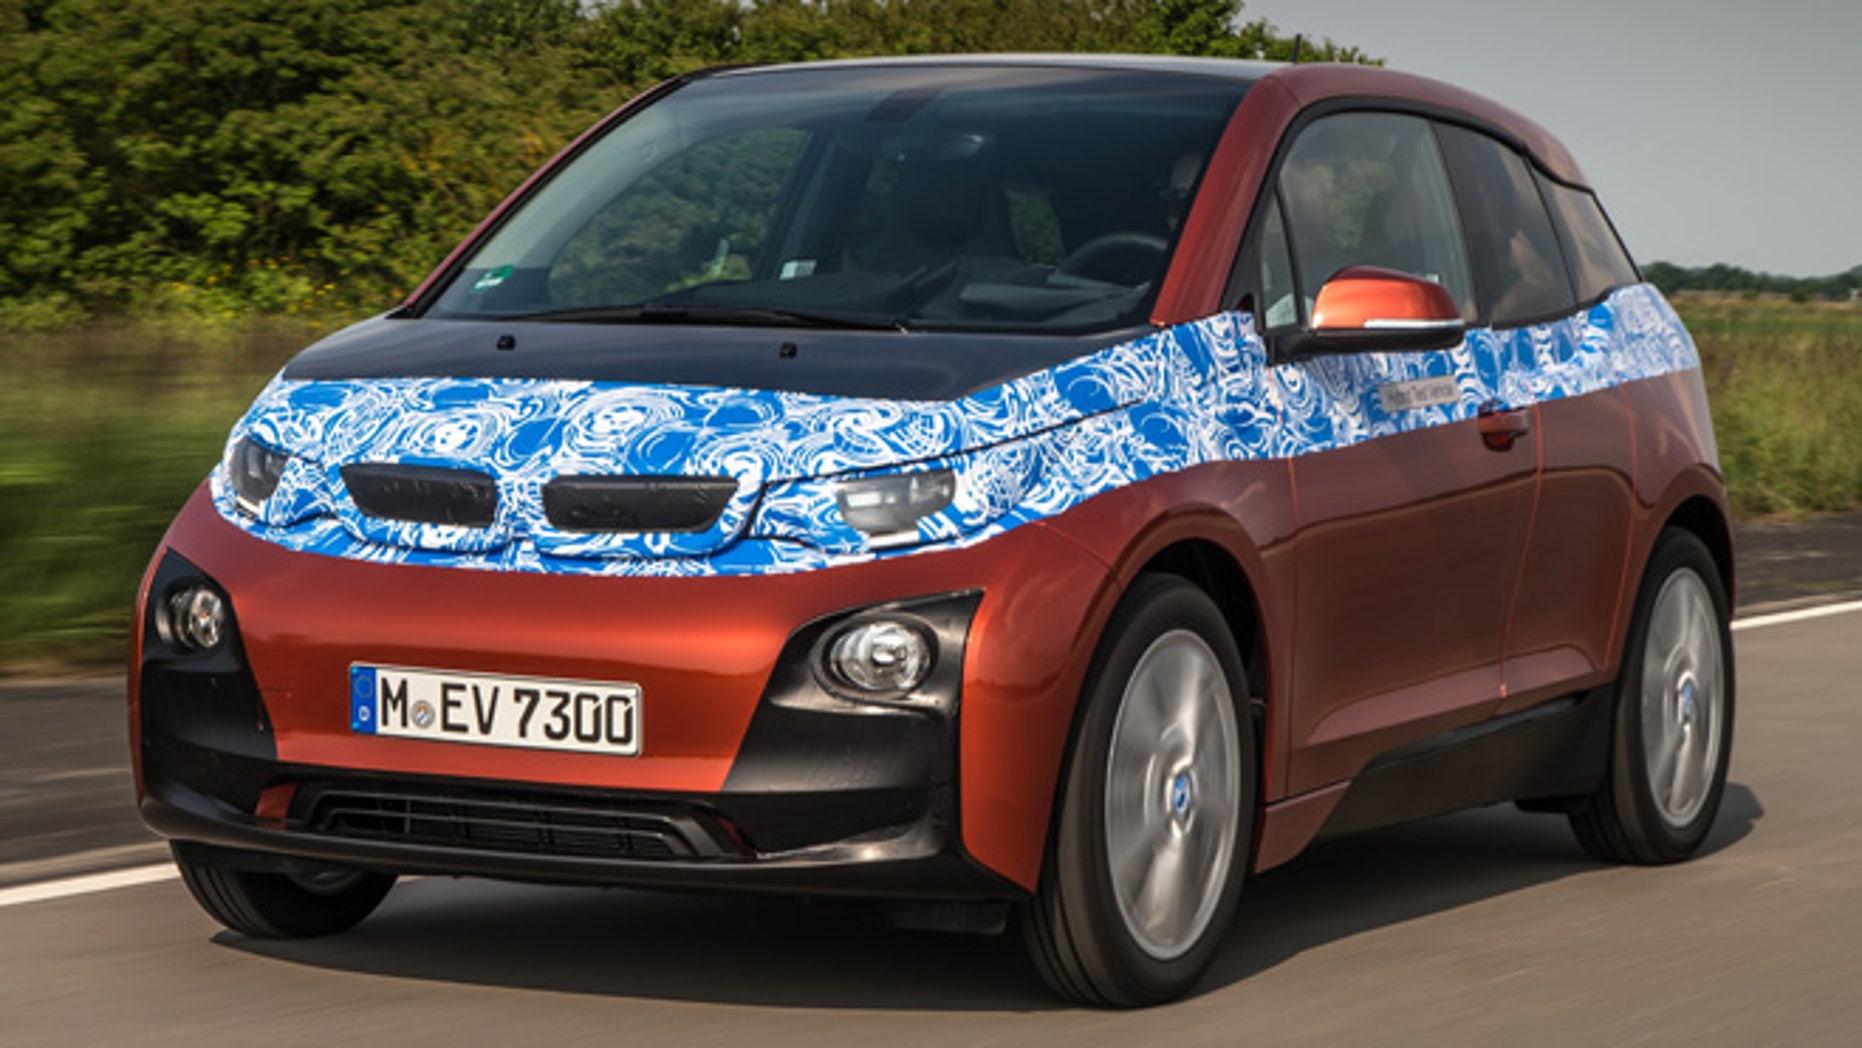 Bmw I3 Electric Car Price Announced Fox News